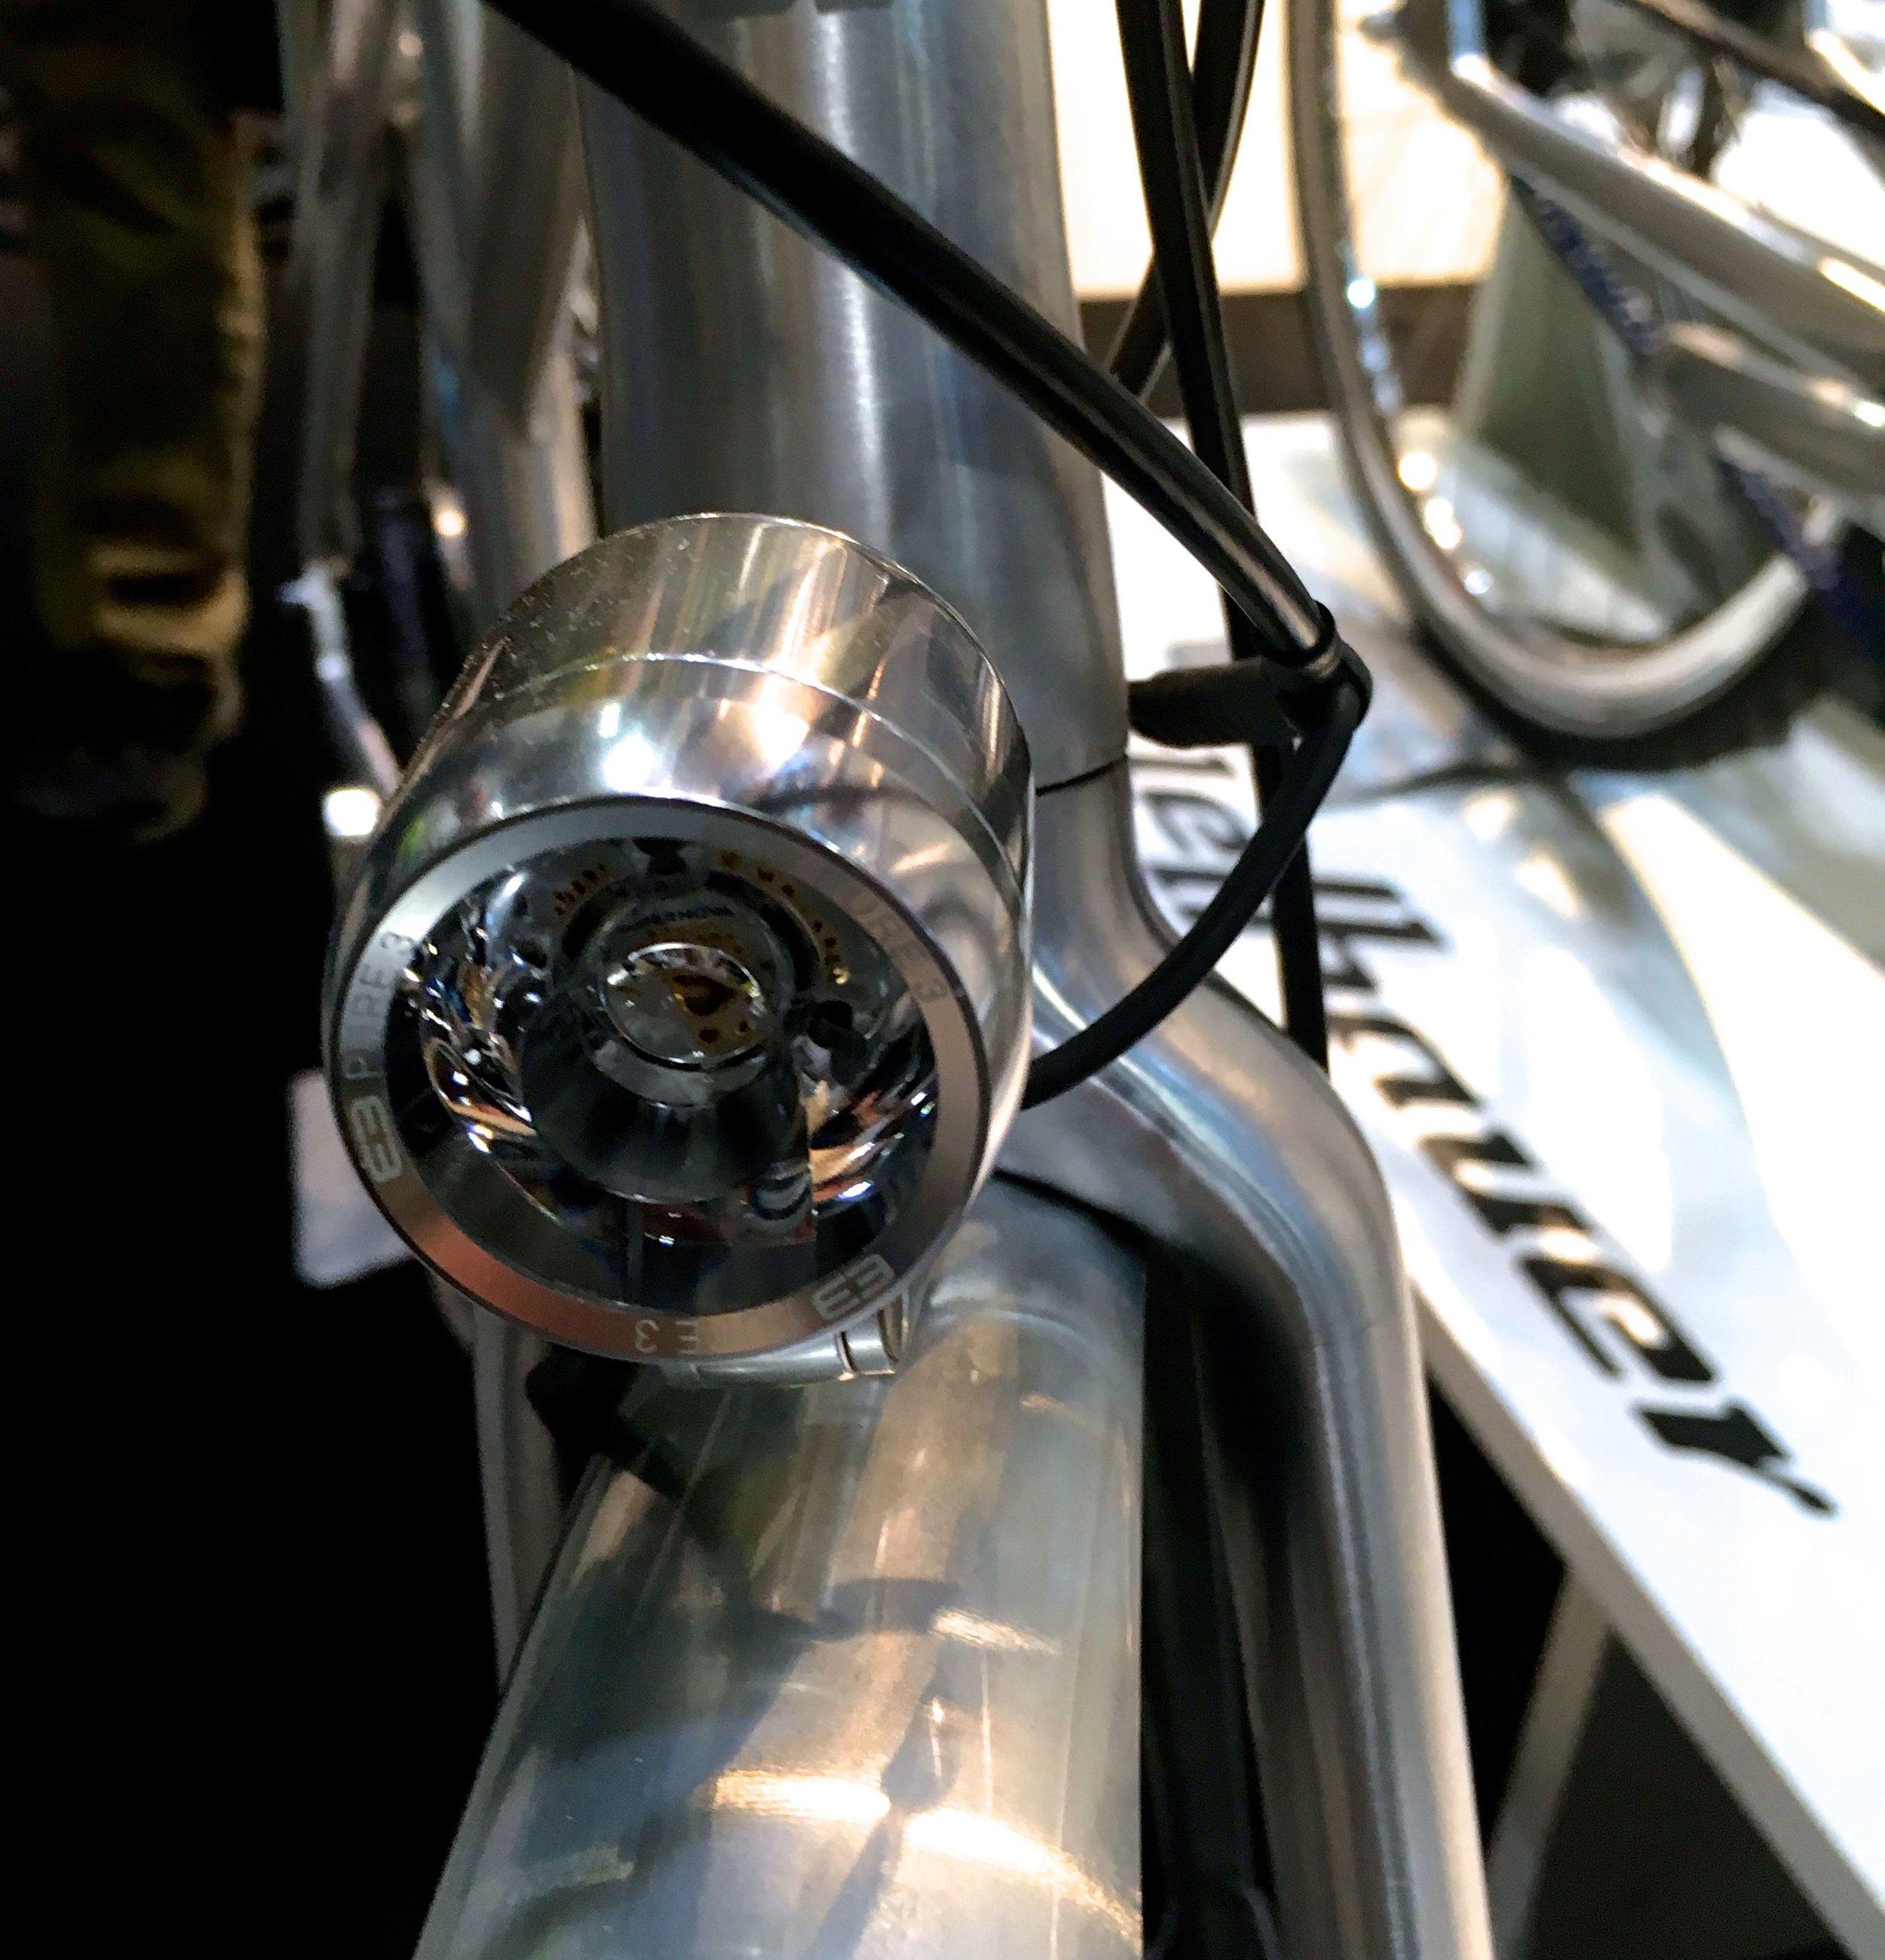 An inbuilt light for the top of the range bike at the London Bike Show